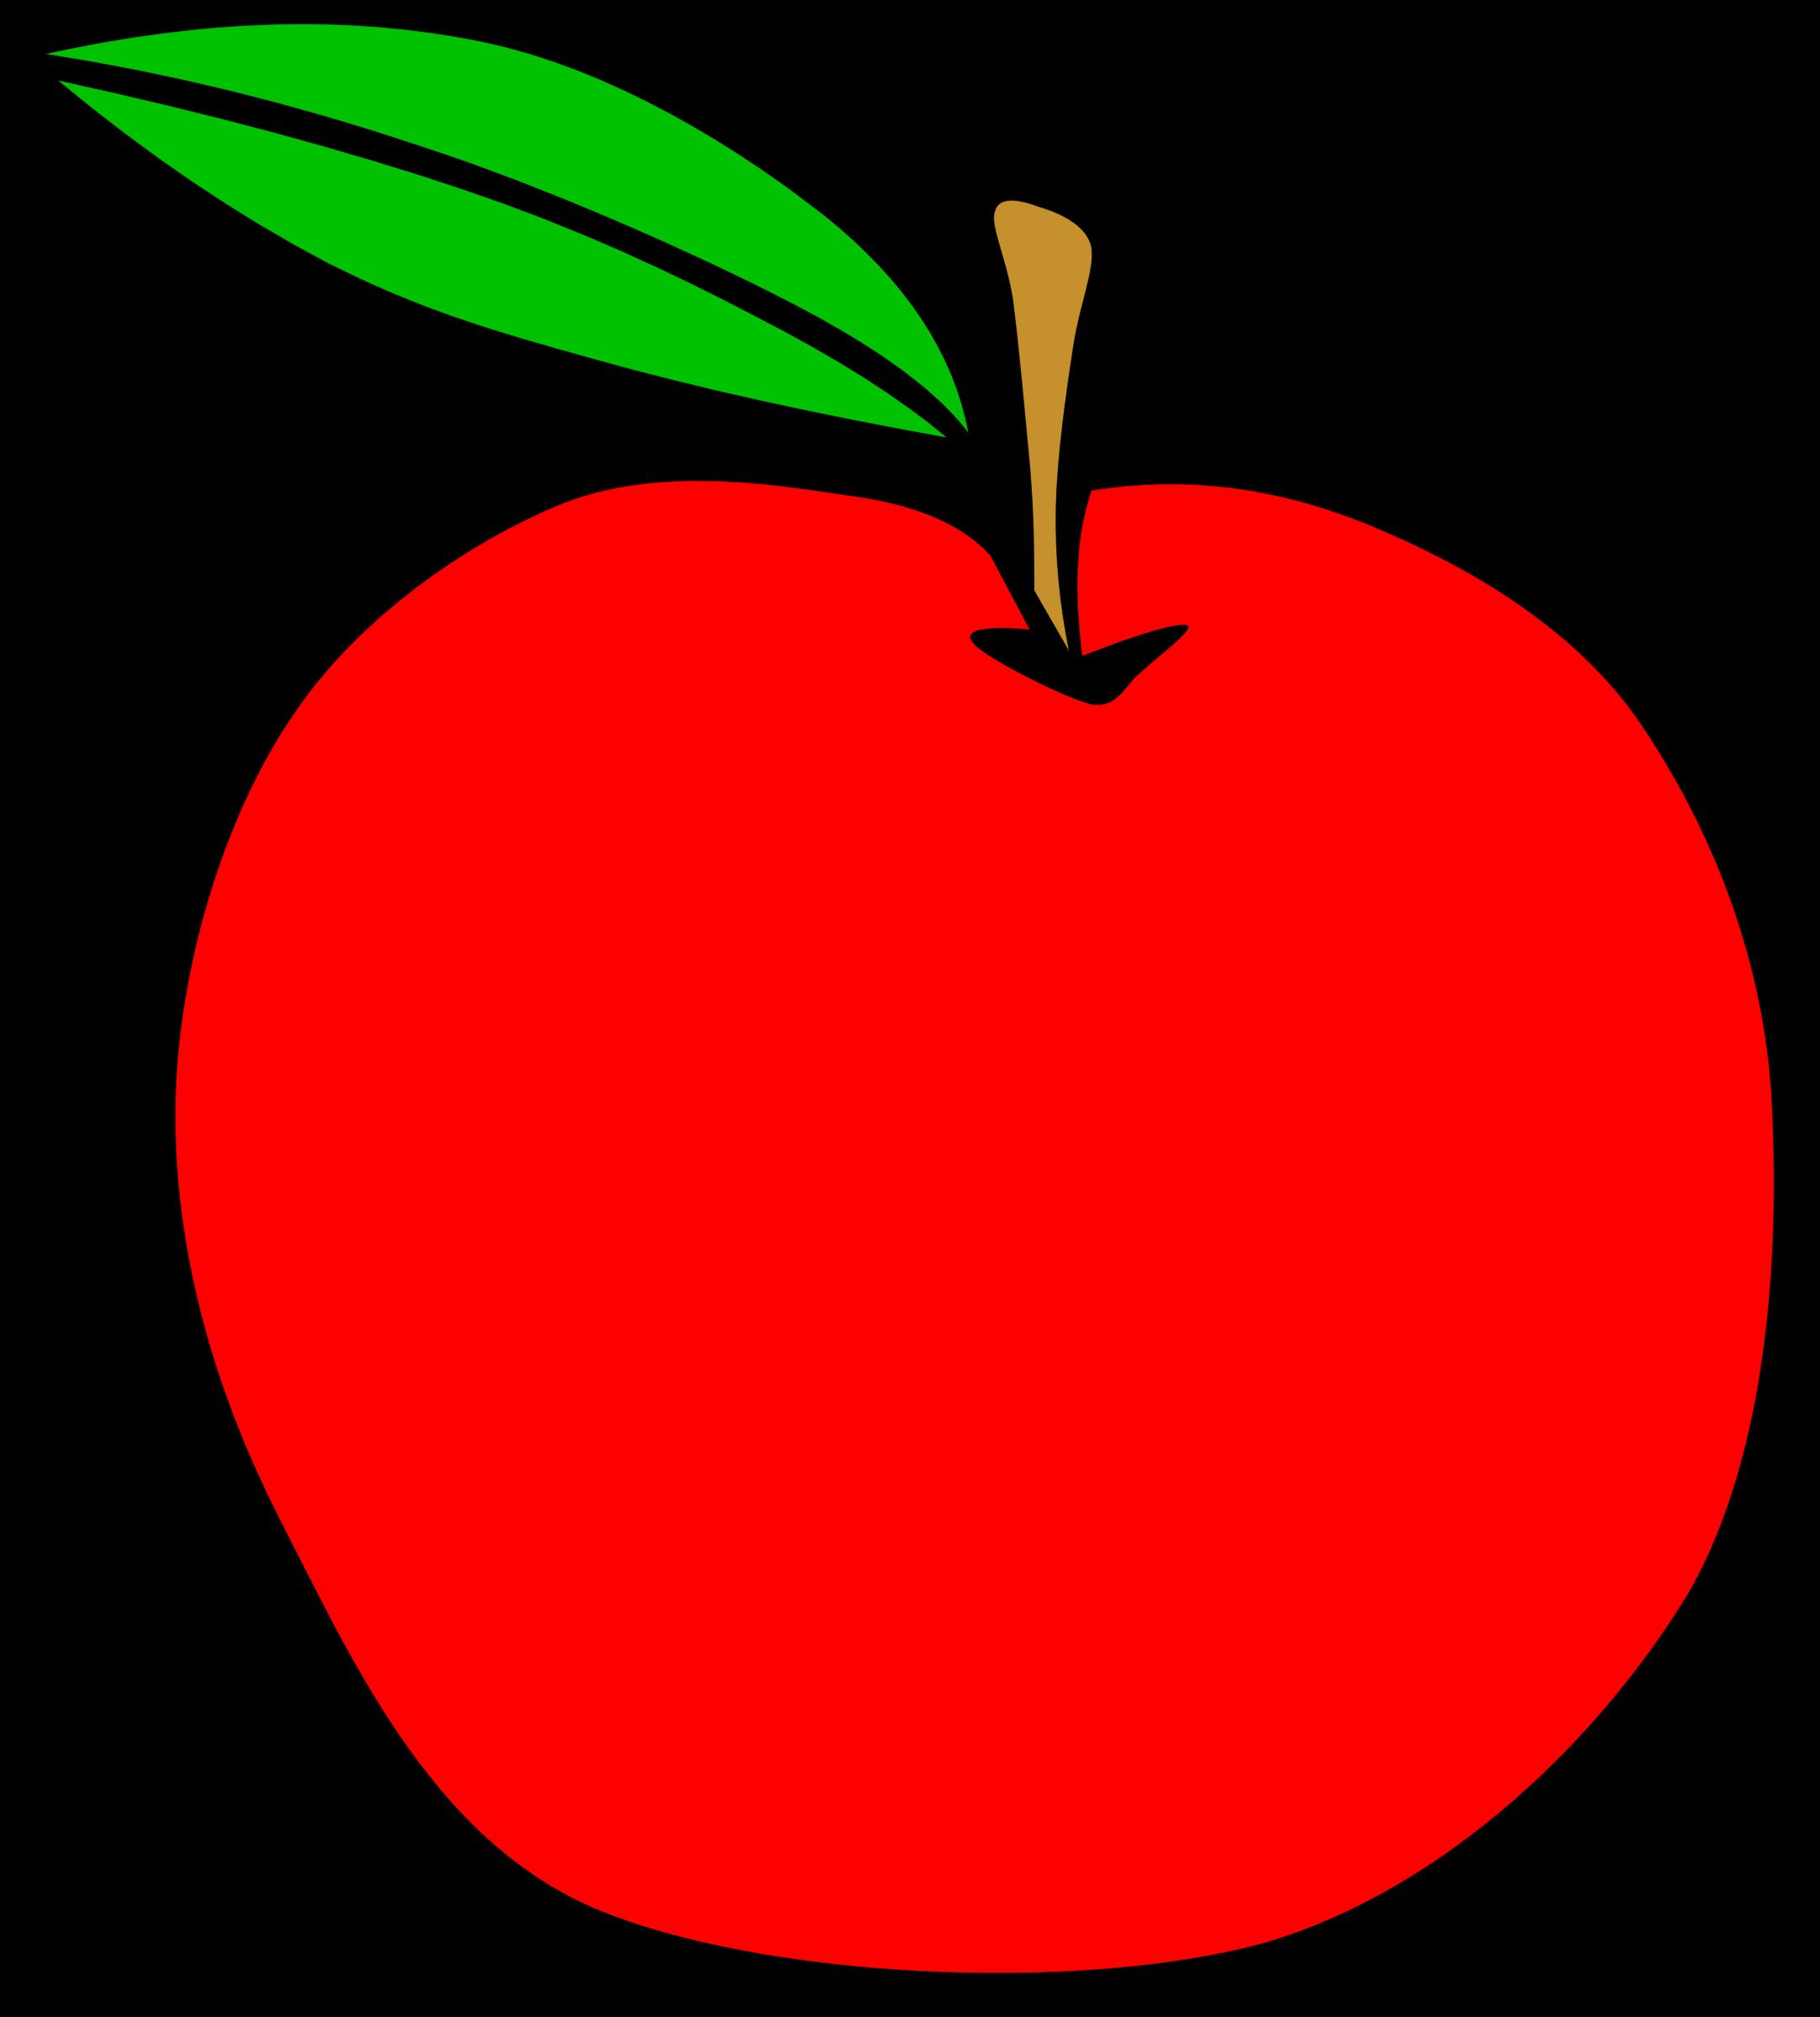 Clipart Of Apple Fruit Apple clip art, Apple